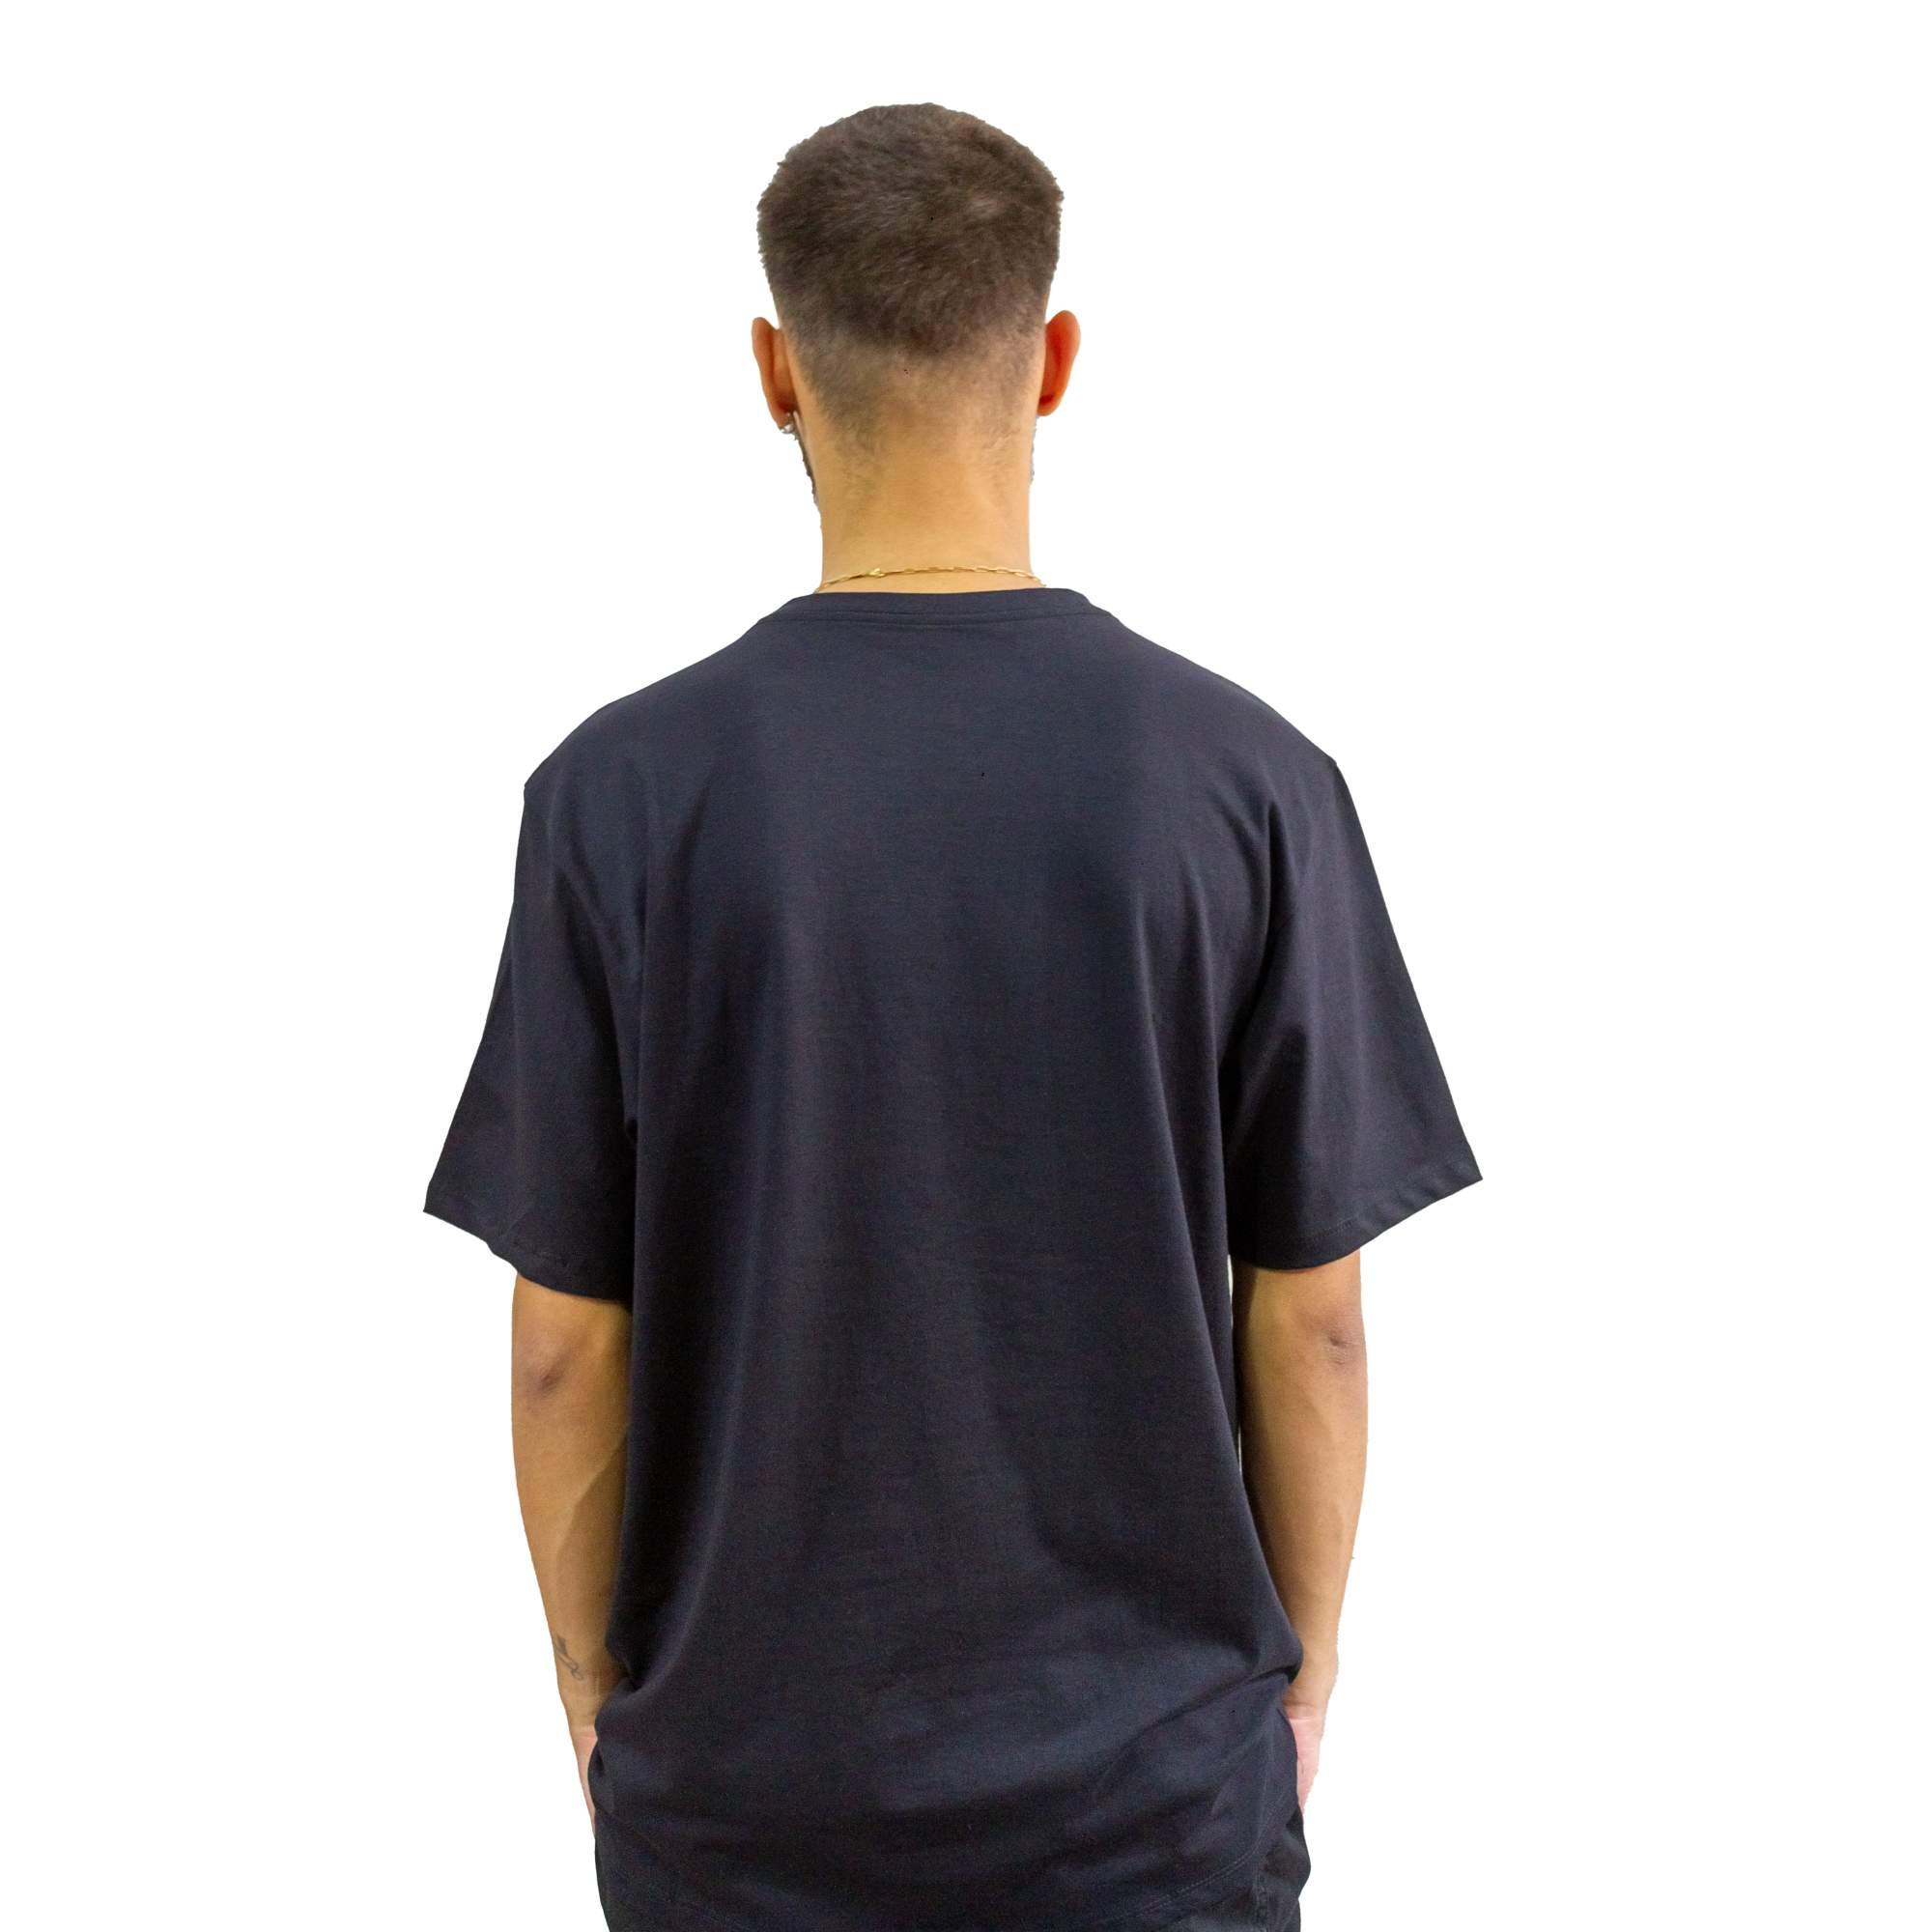 Camiseta Hurley Silk Camuflada Black